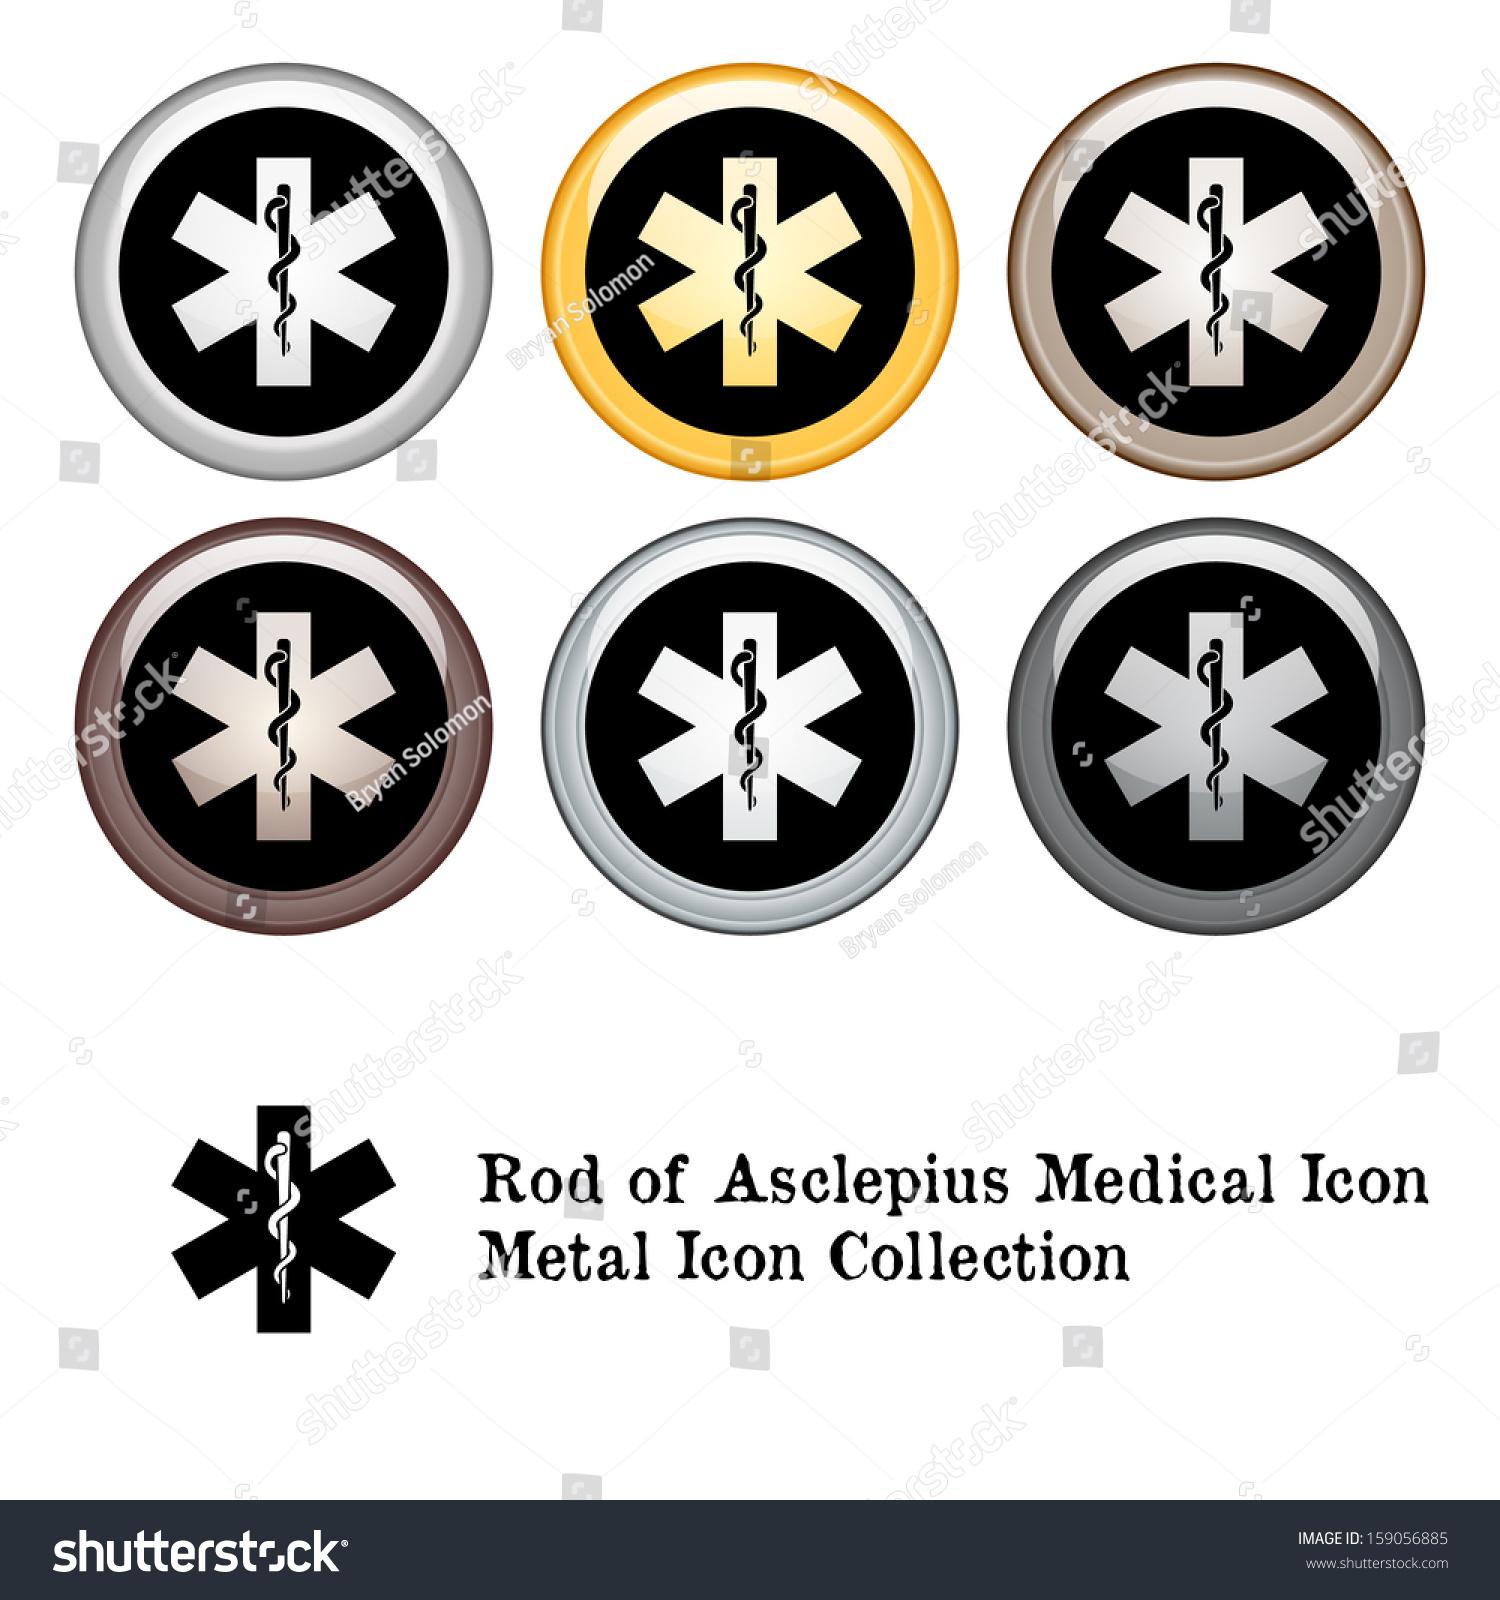 Royalty Free Stock Illustration Of Medical Symbol Rod Asclepius Icon